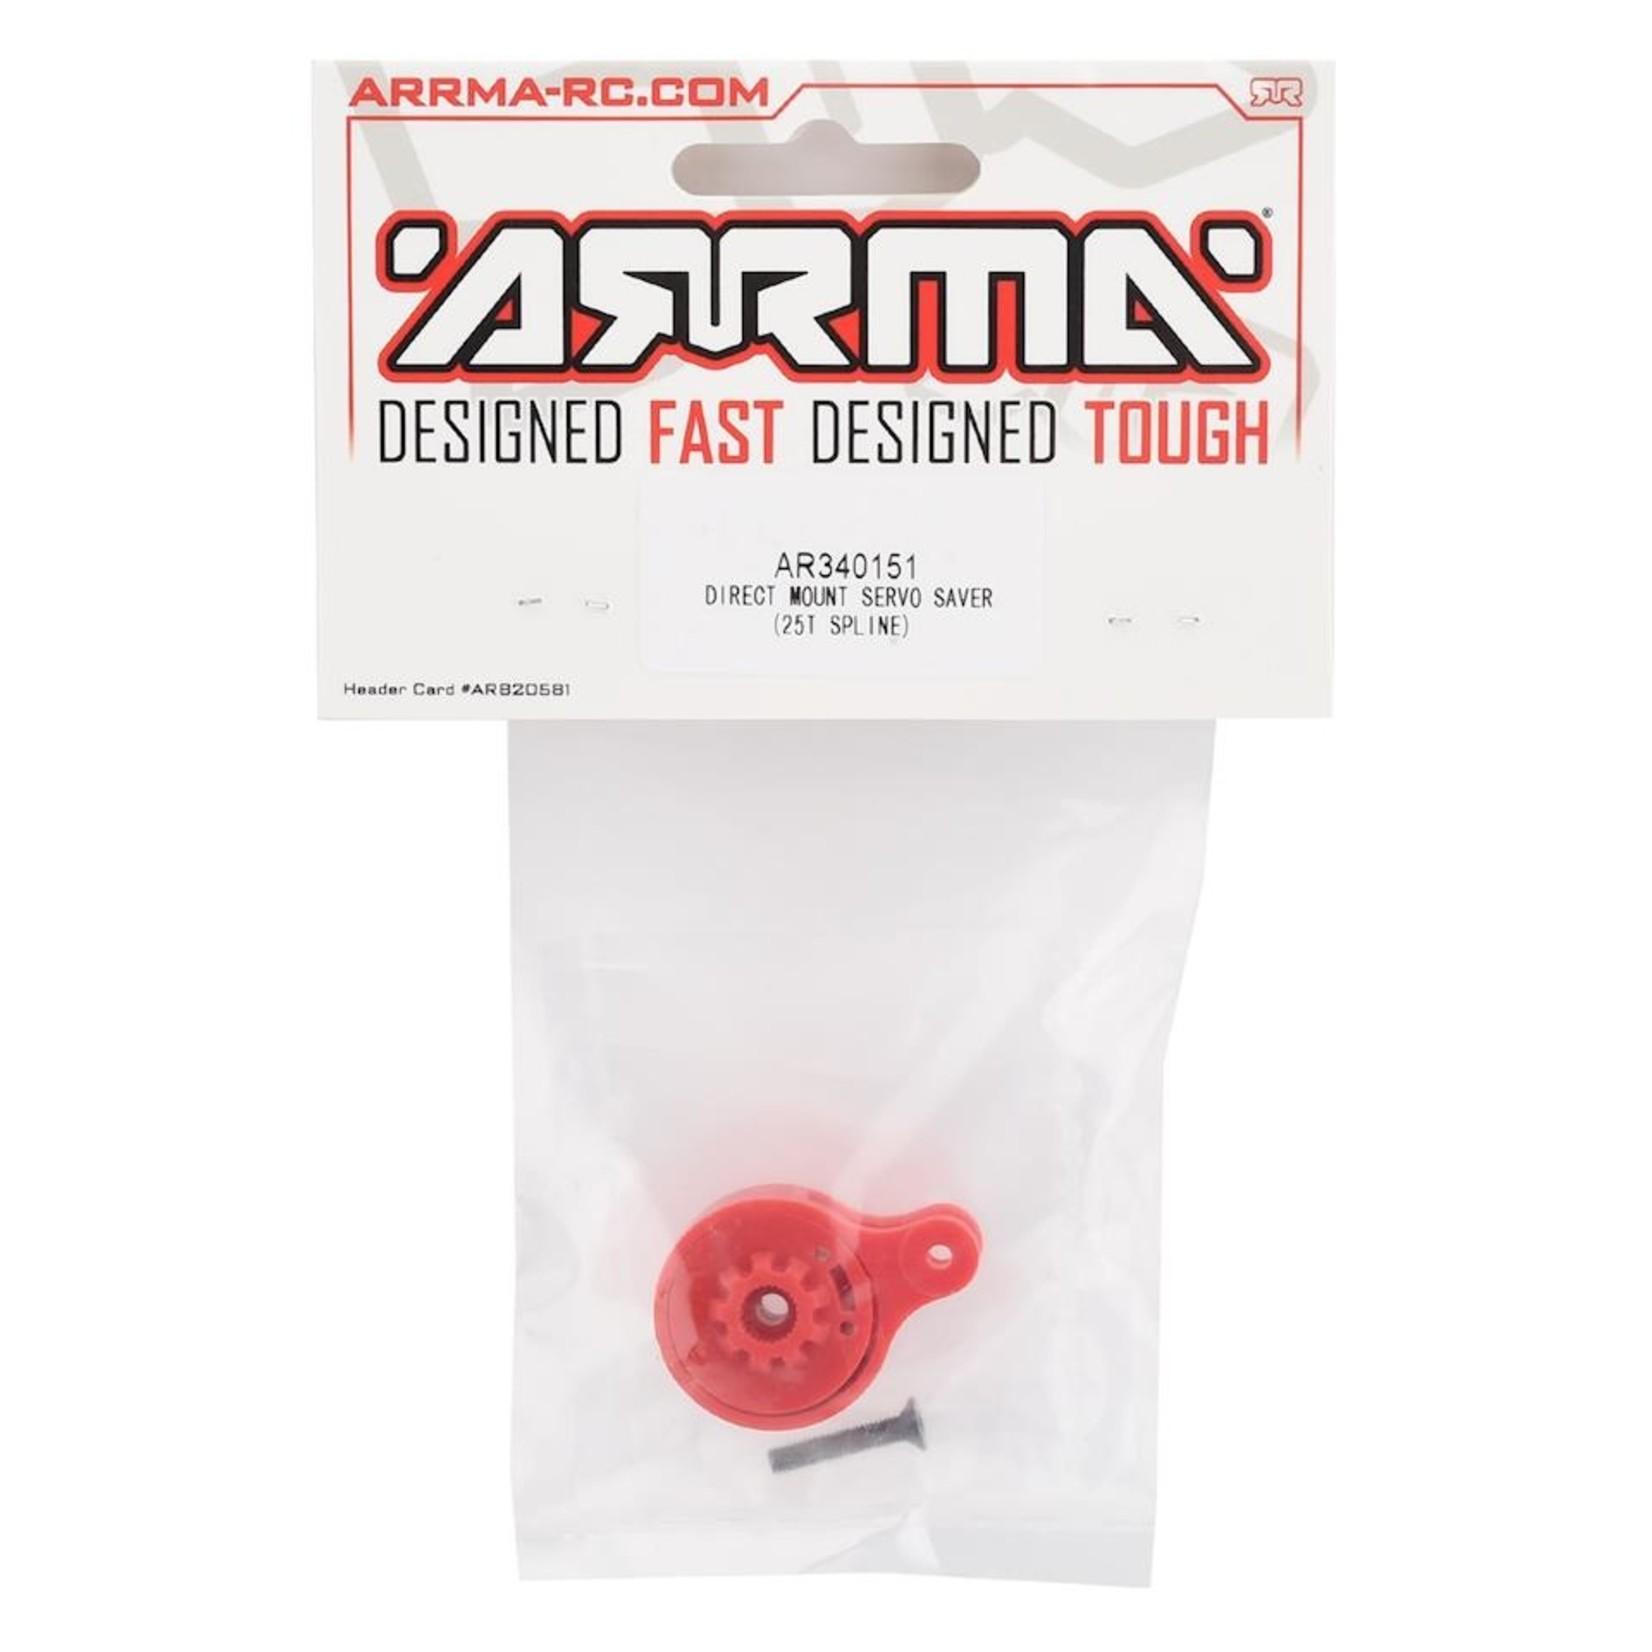 ARRMA AR340151 Arrma Servo Saver Set 25T